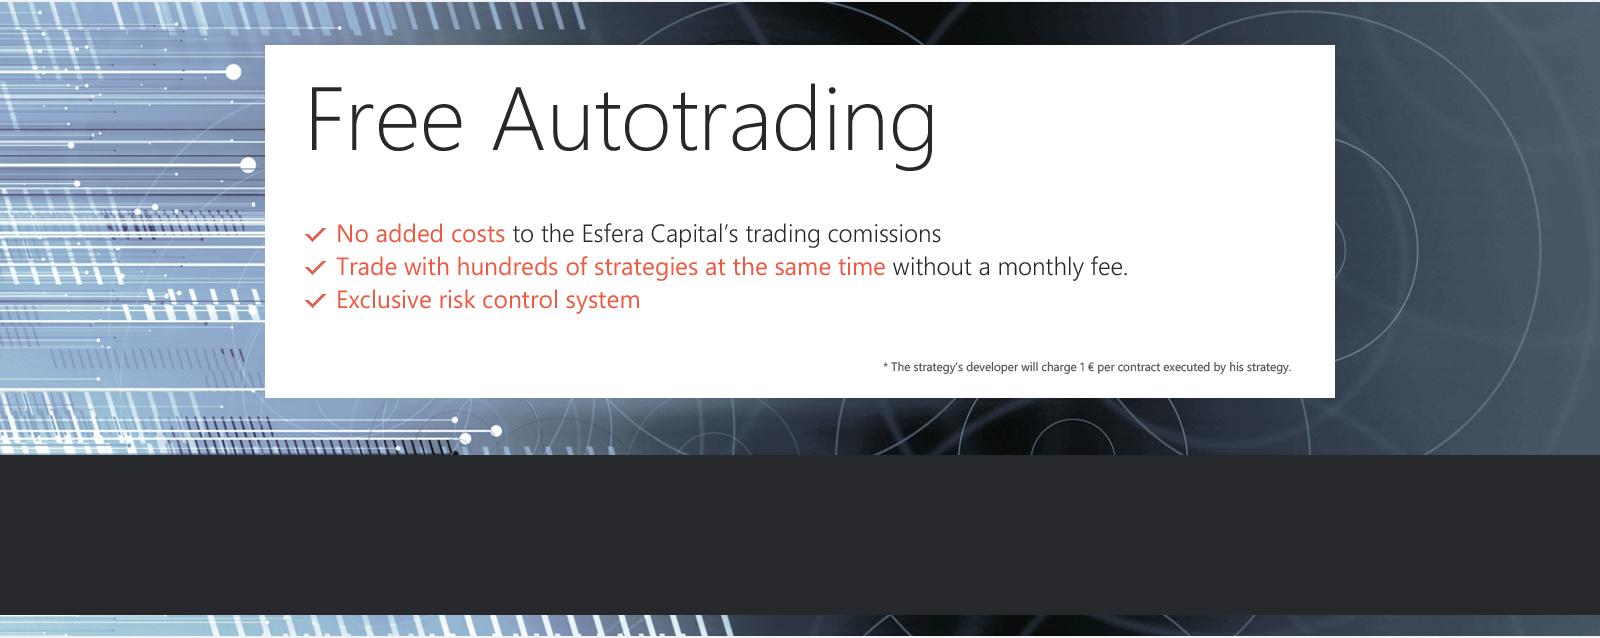 Team Trading–Strategies' portfolios of multiple developers